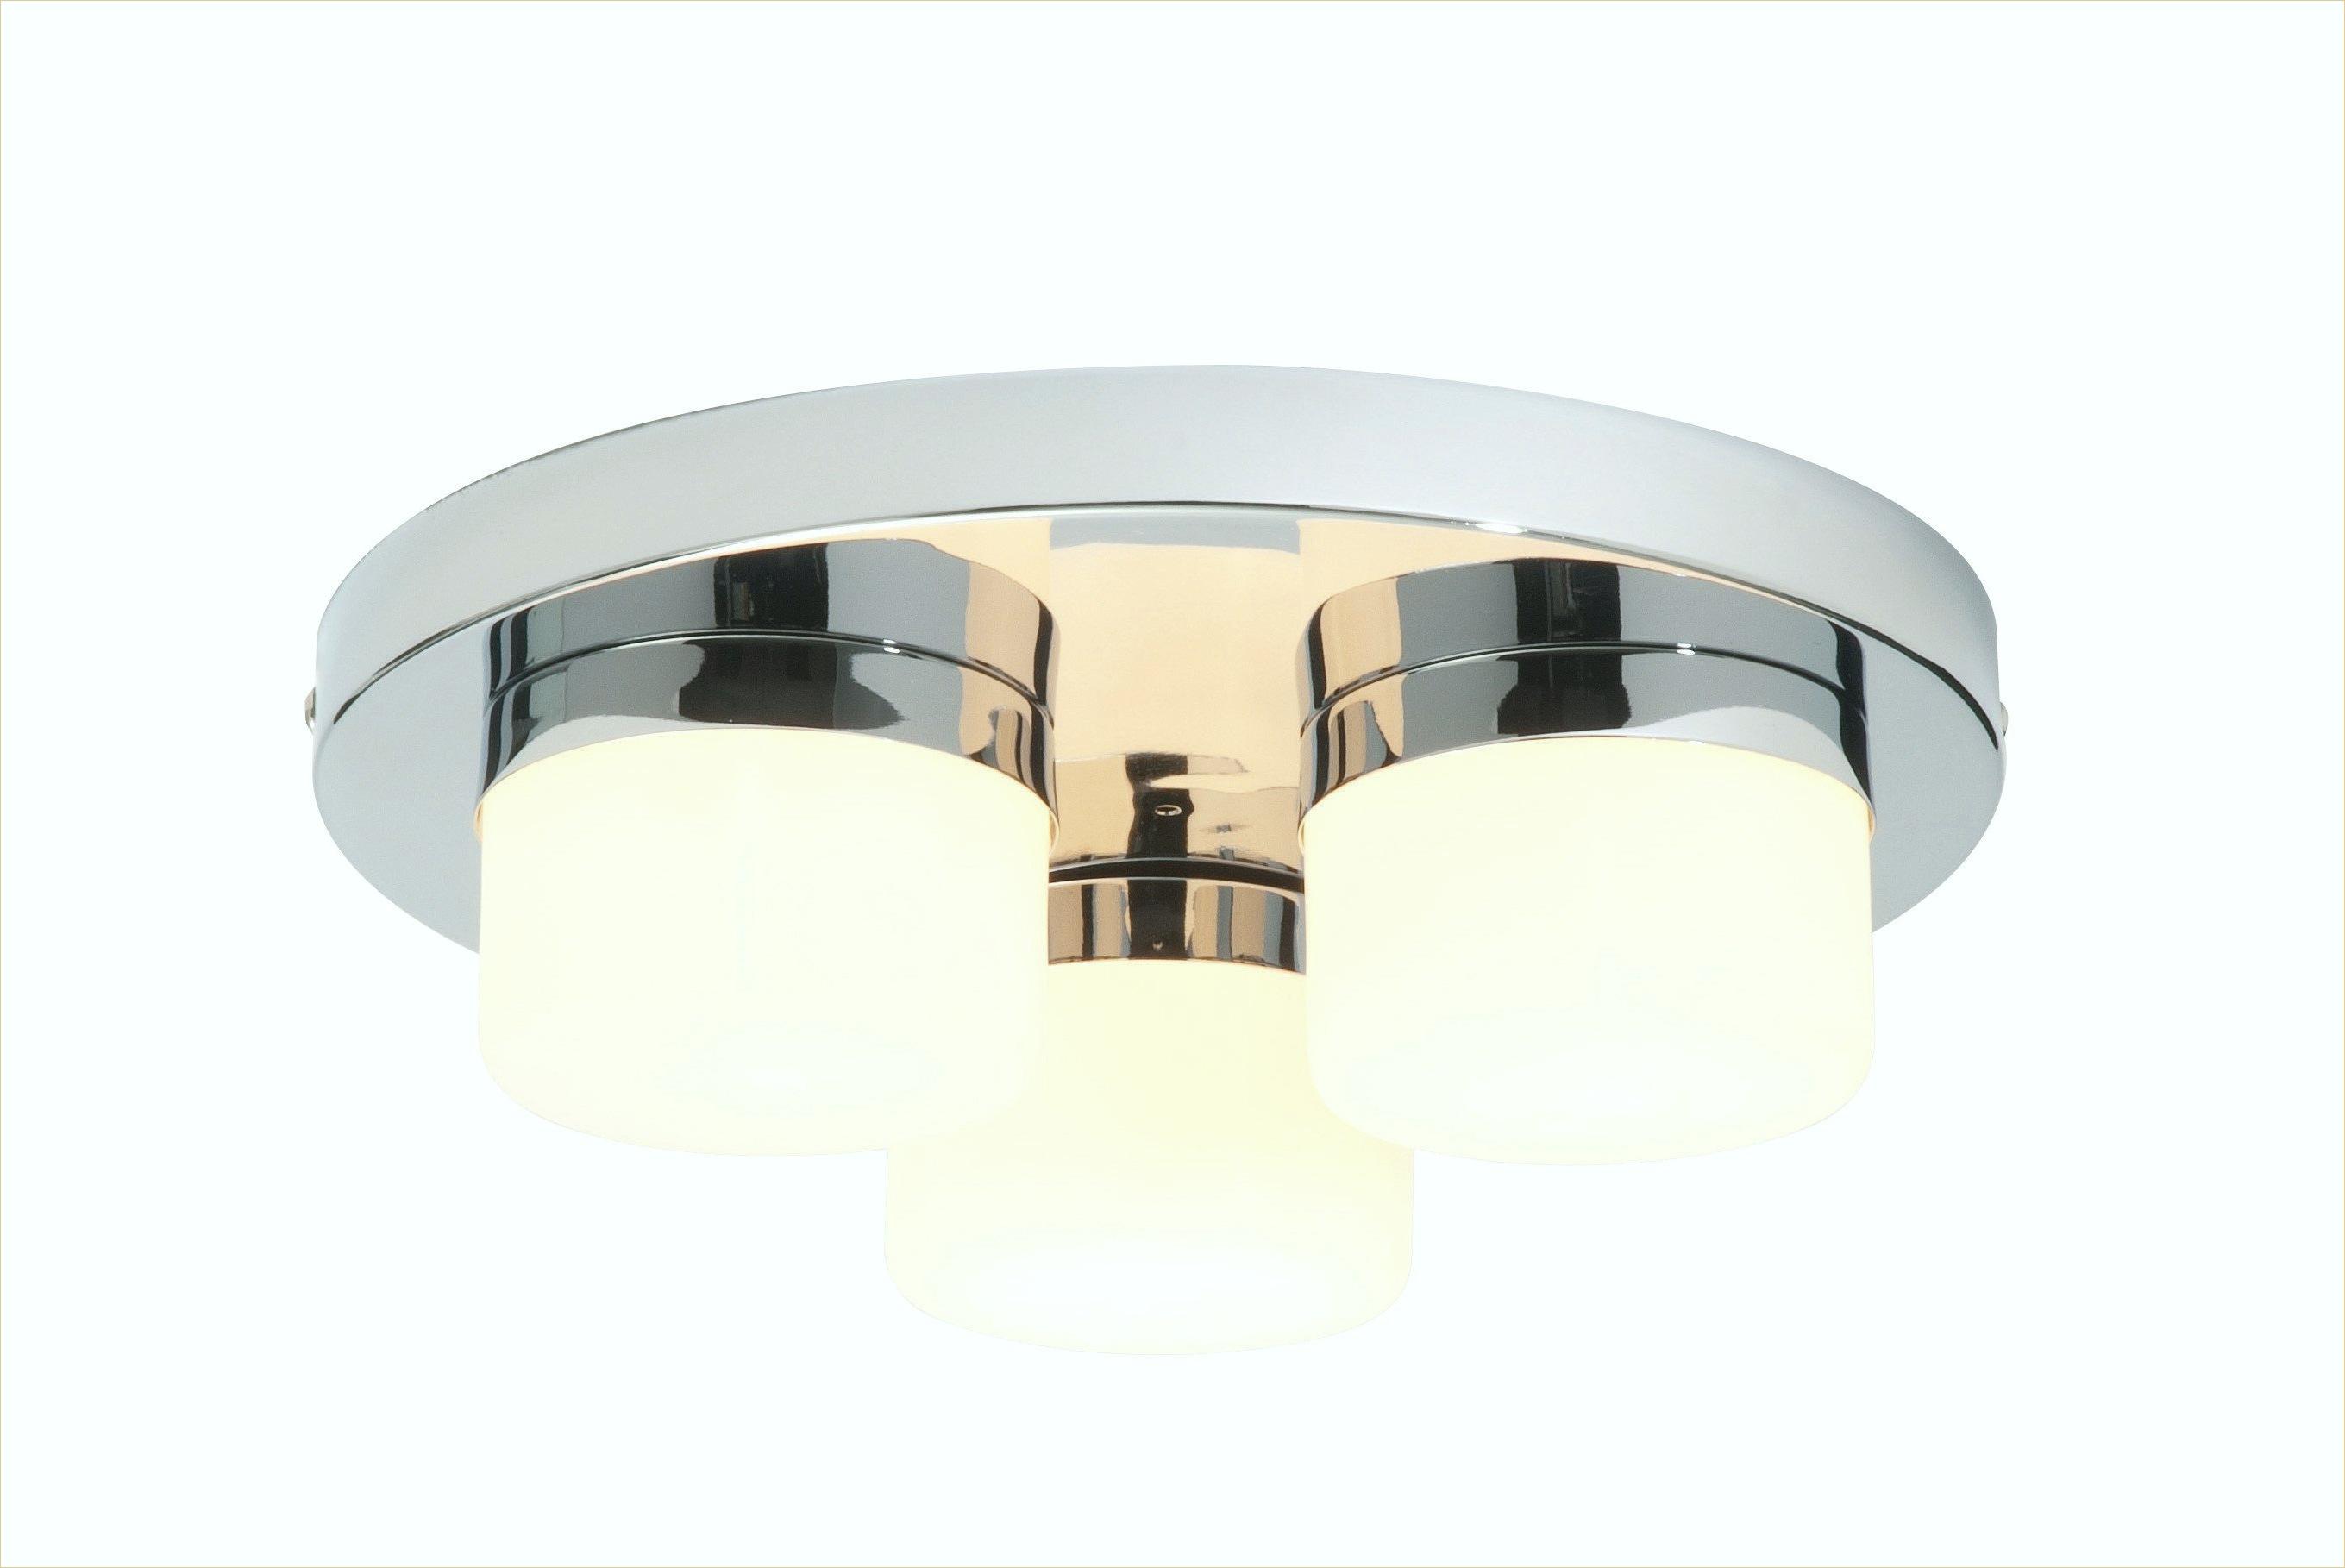 Plafonnier Salle De Bain Ikea Frais Galerie Lustre Rectangulaire Inspirant Ikea Plafonnier Frais Plafonnier